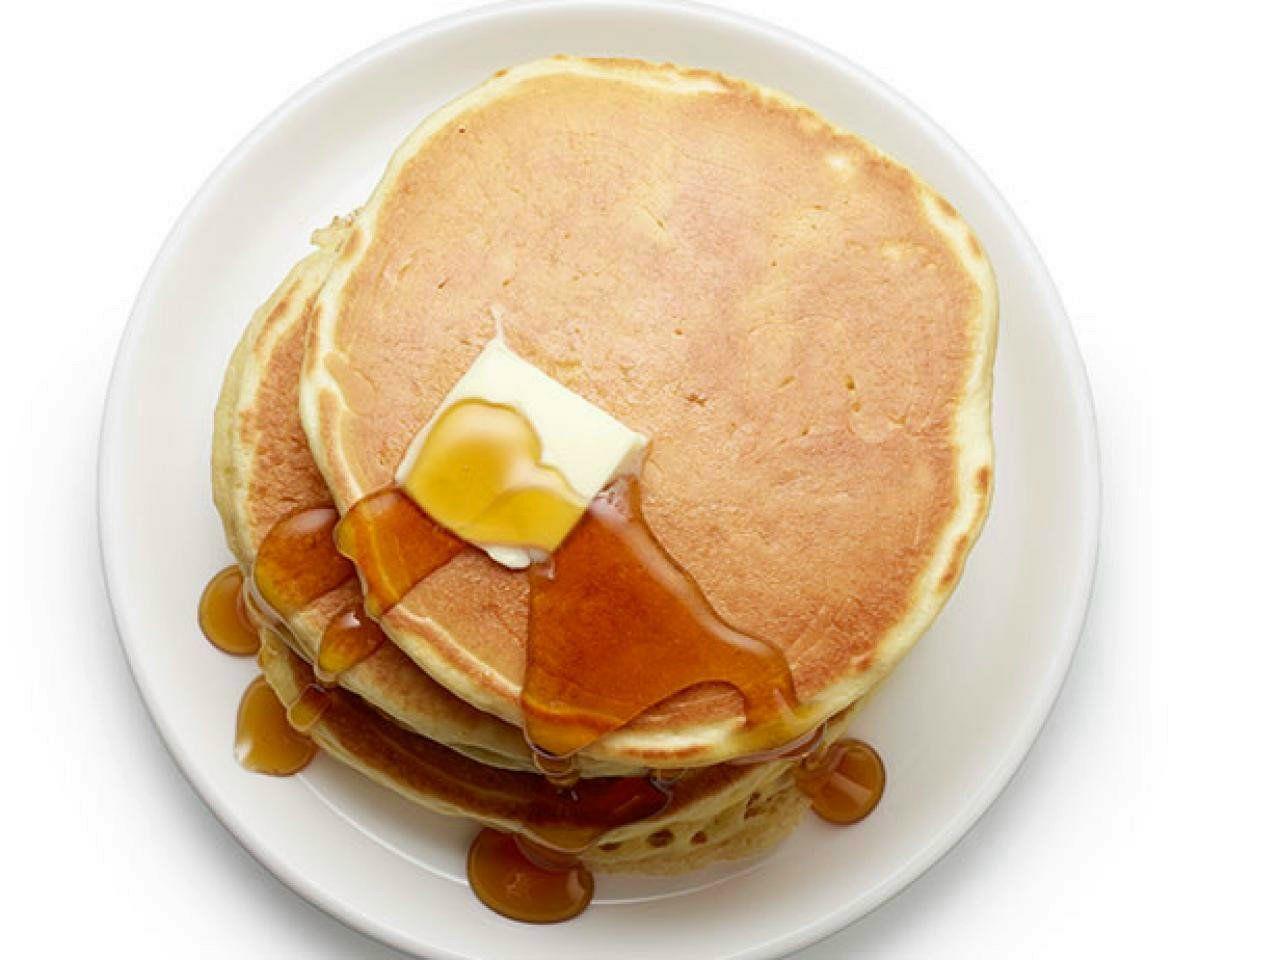 fnm_050113-perfect-pancakes_s4x3.jpg.rend.hgtvcom.1280.960-cooking